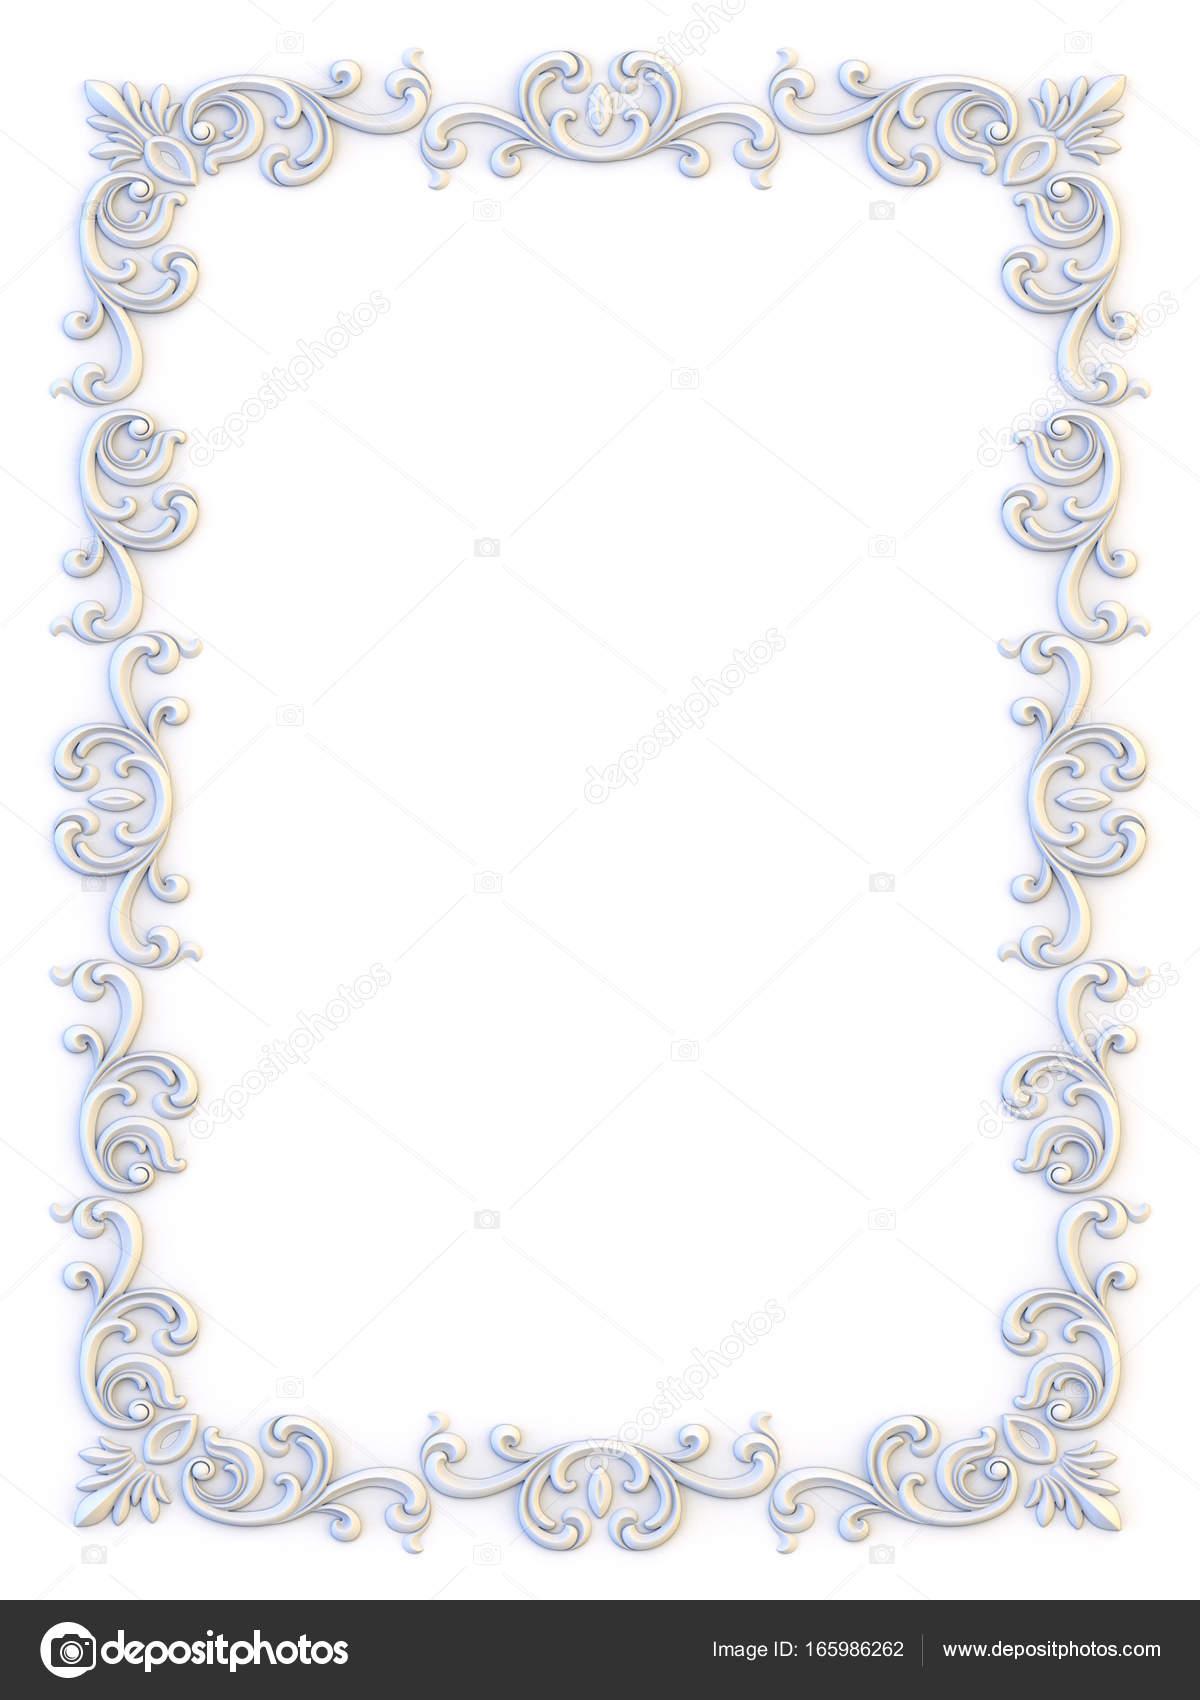 Ornamentale Vintage-Rahmen. Floral Design-Vorlage. Seite Dekoration ...